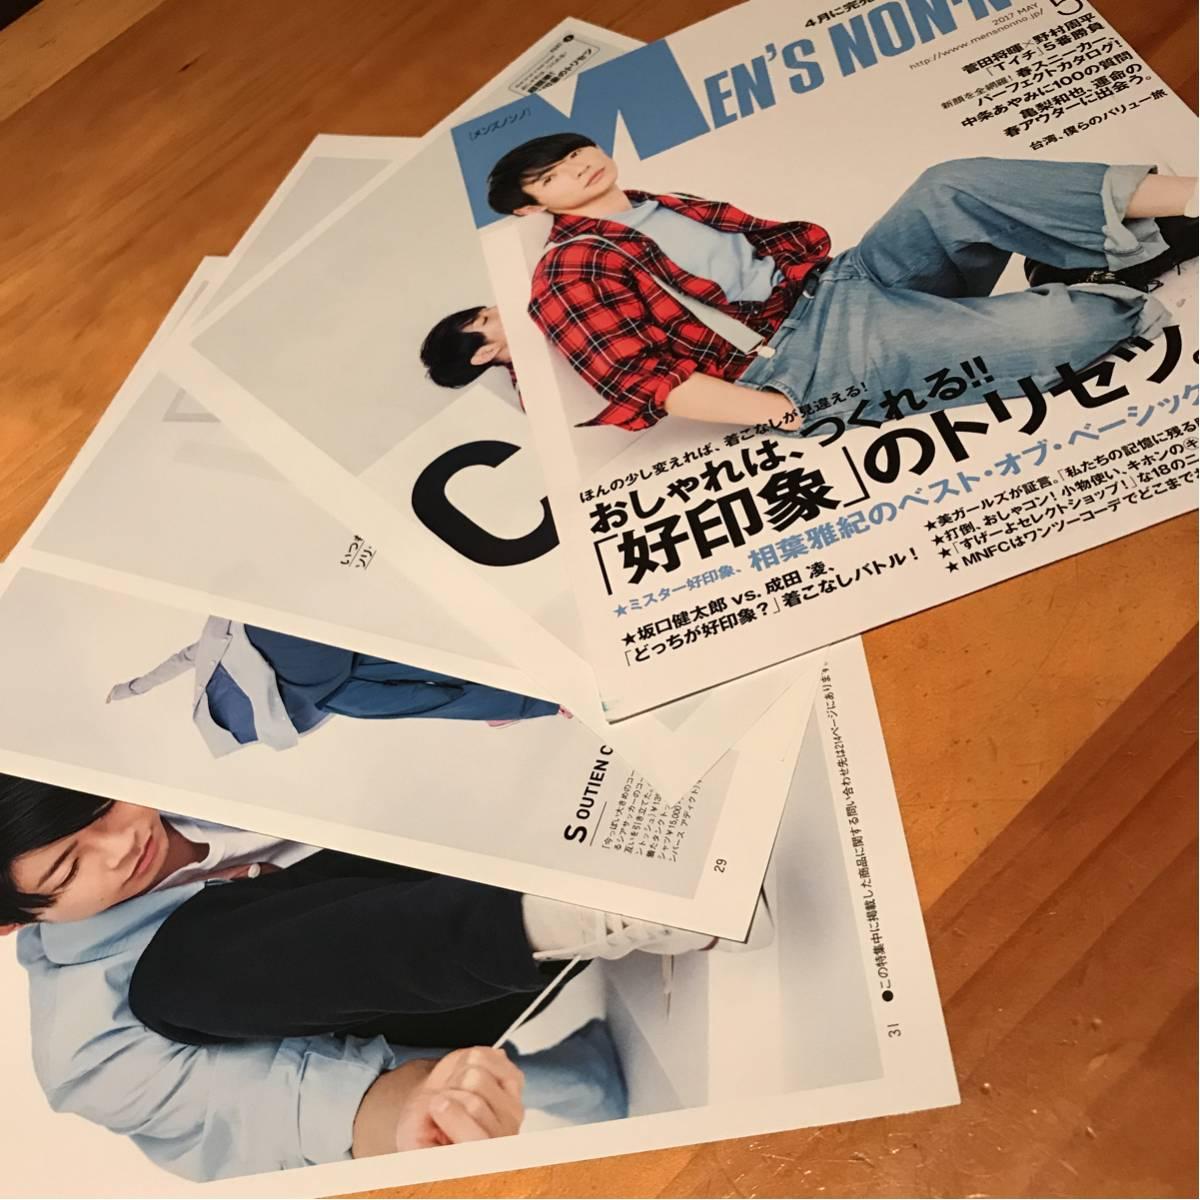 MEN'S NON-NO(メンズノンノ) 2017年5月号 相葉雅紀 切り取り6P + 表紙